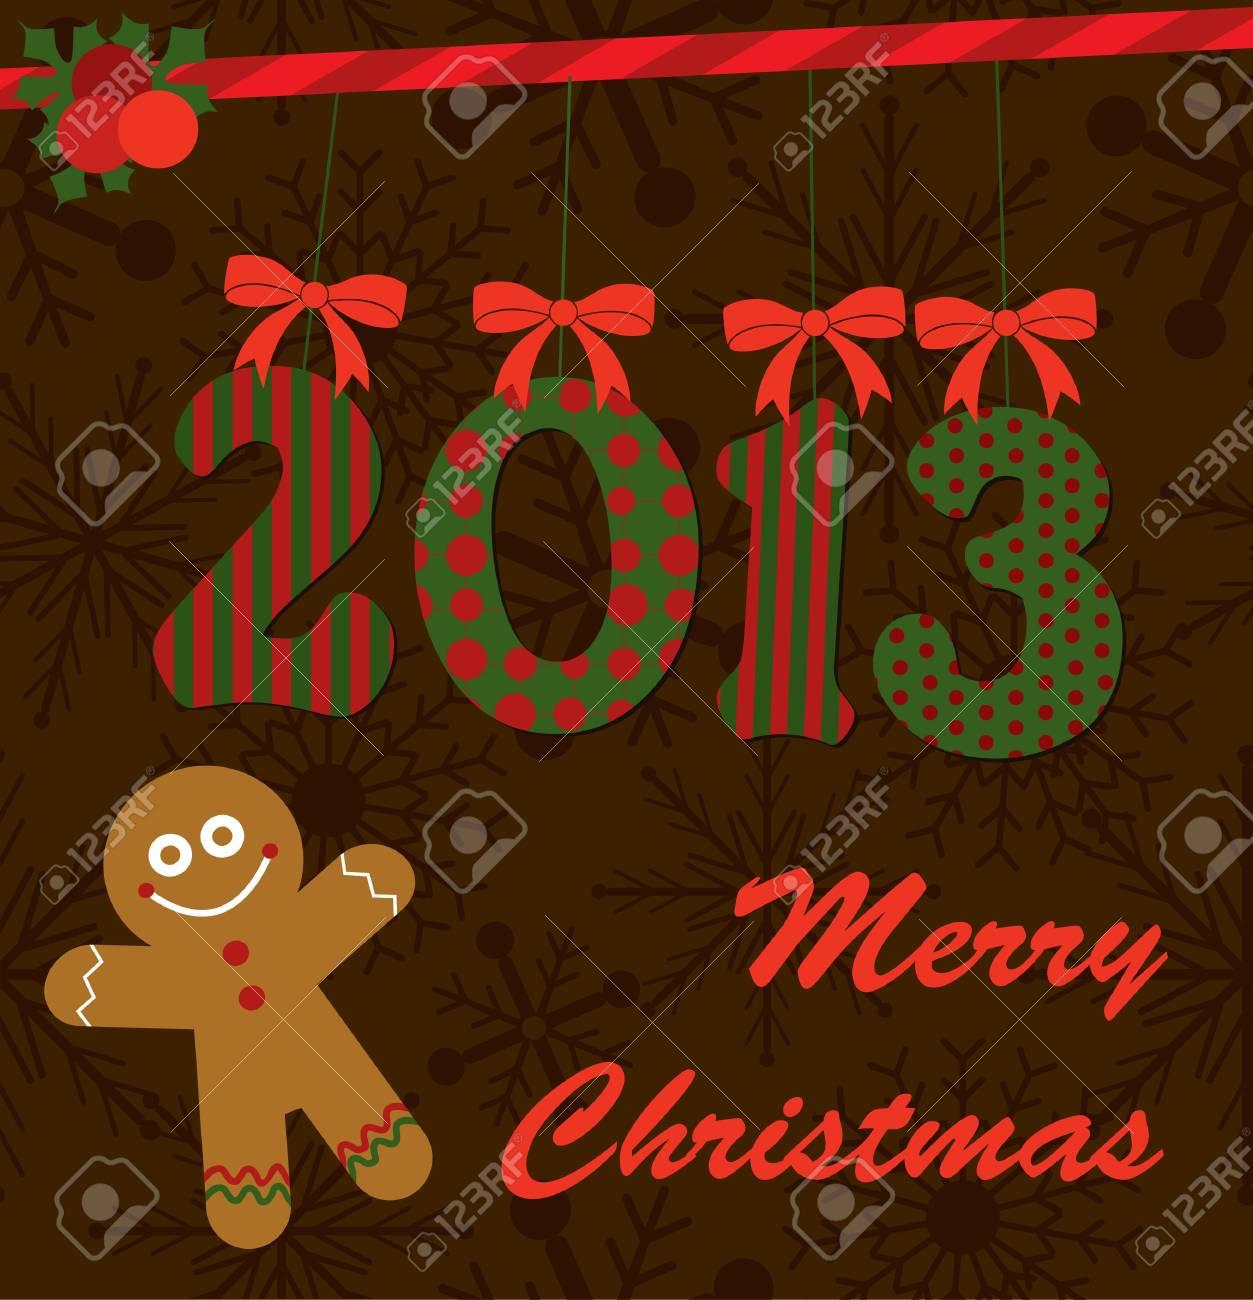 merry christmas card design  vector illustration Stock Vector - 19252424